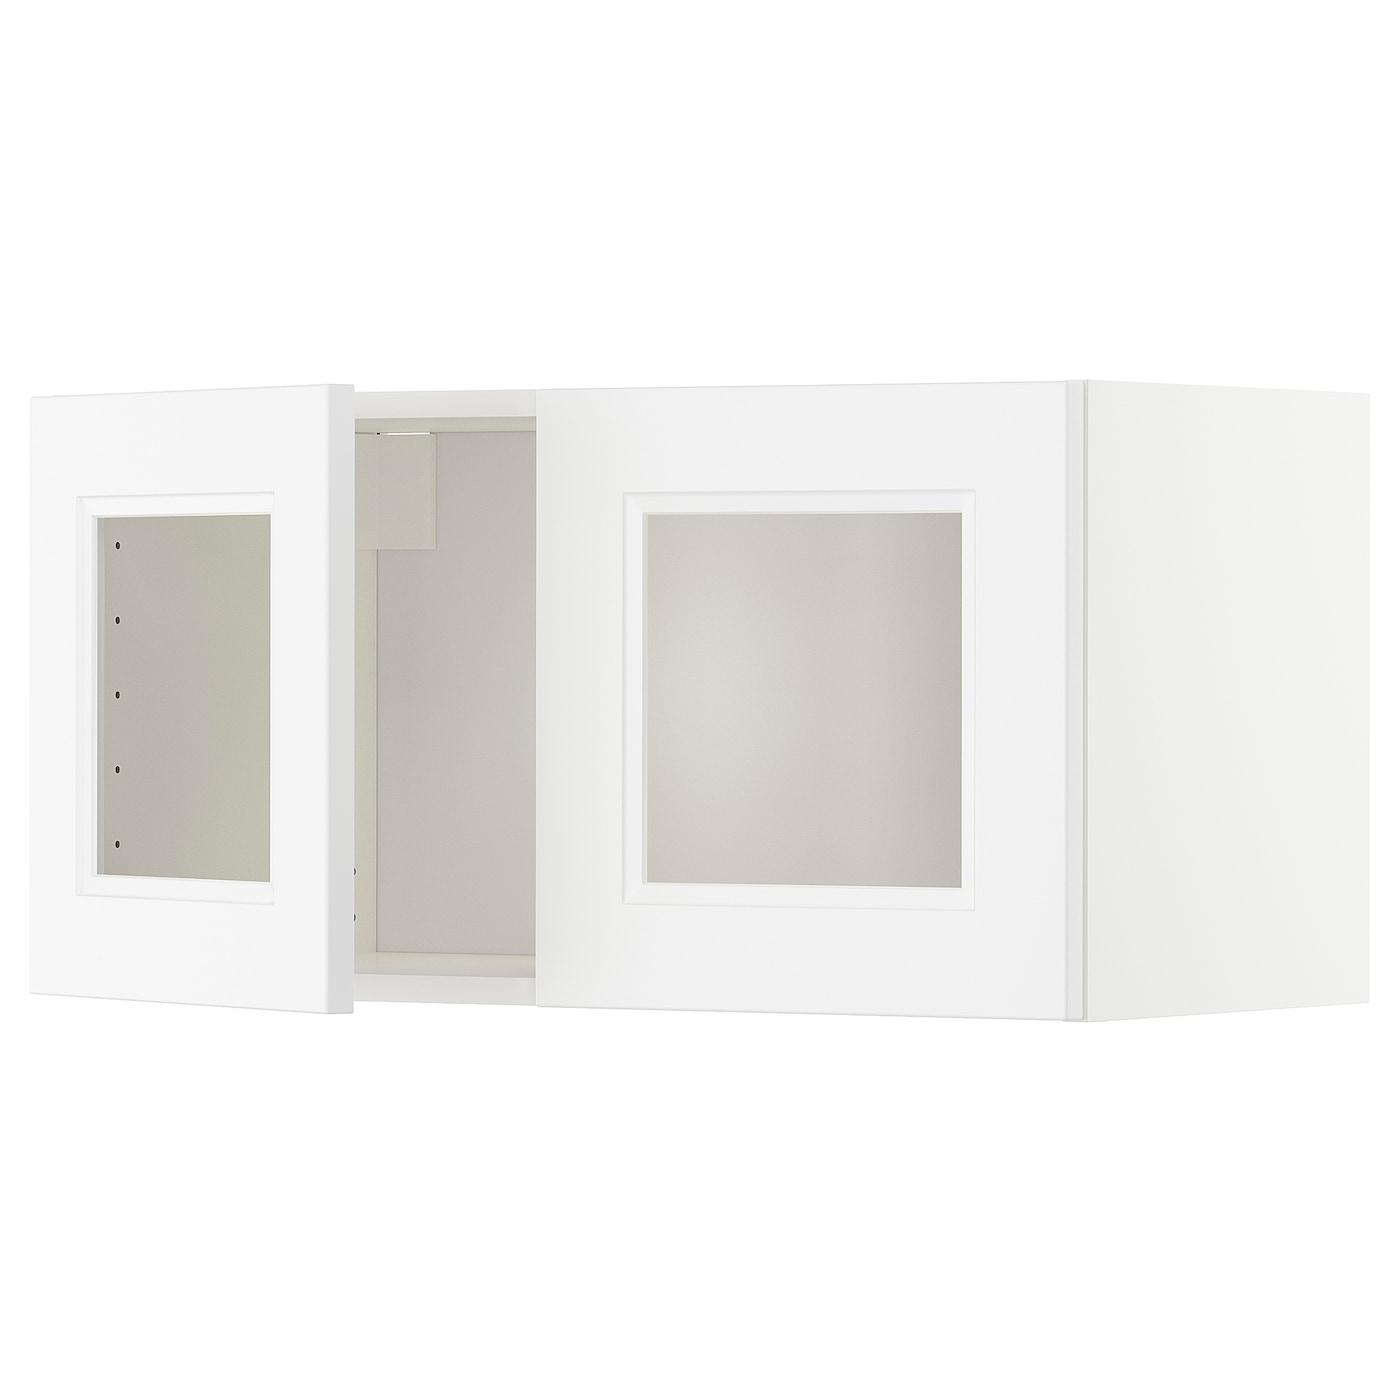 IKEA METOD armario de pared cocina con puertas 0d9138b70aba